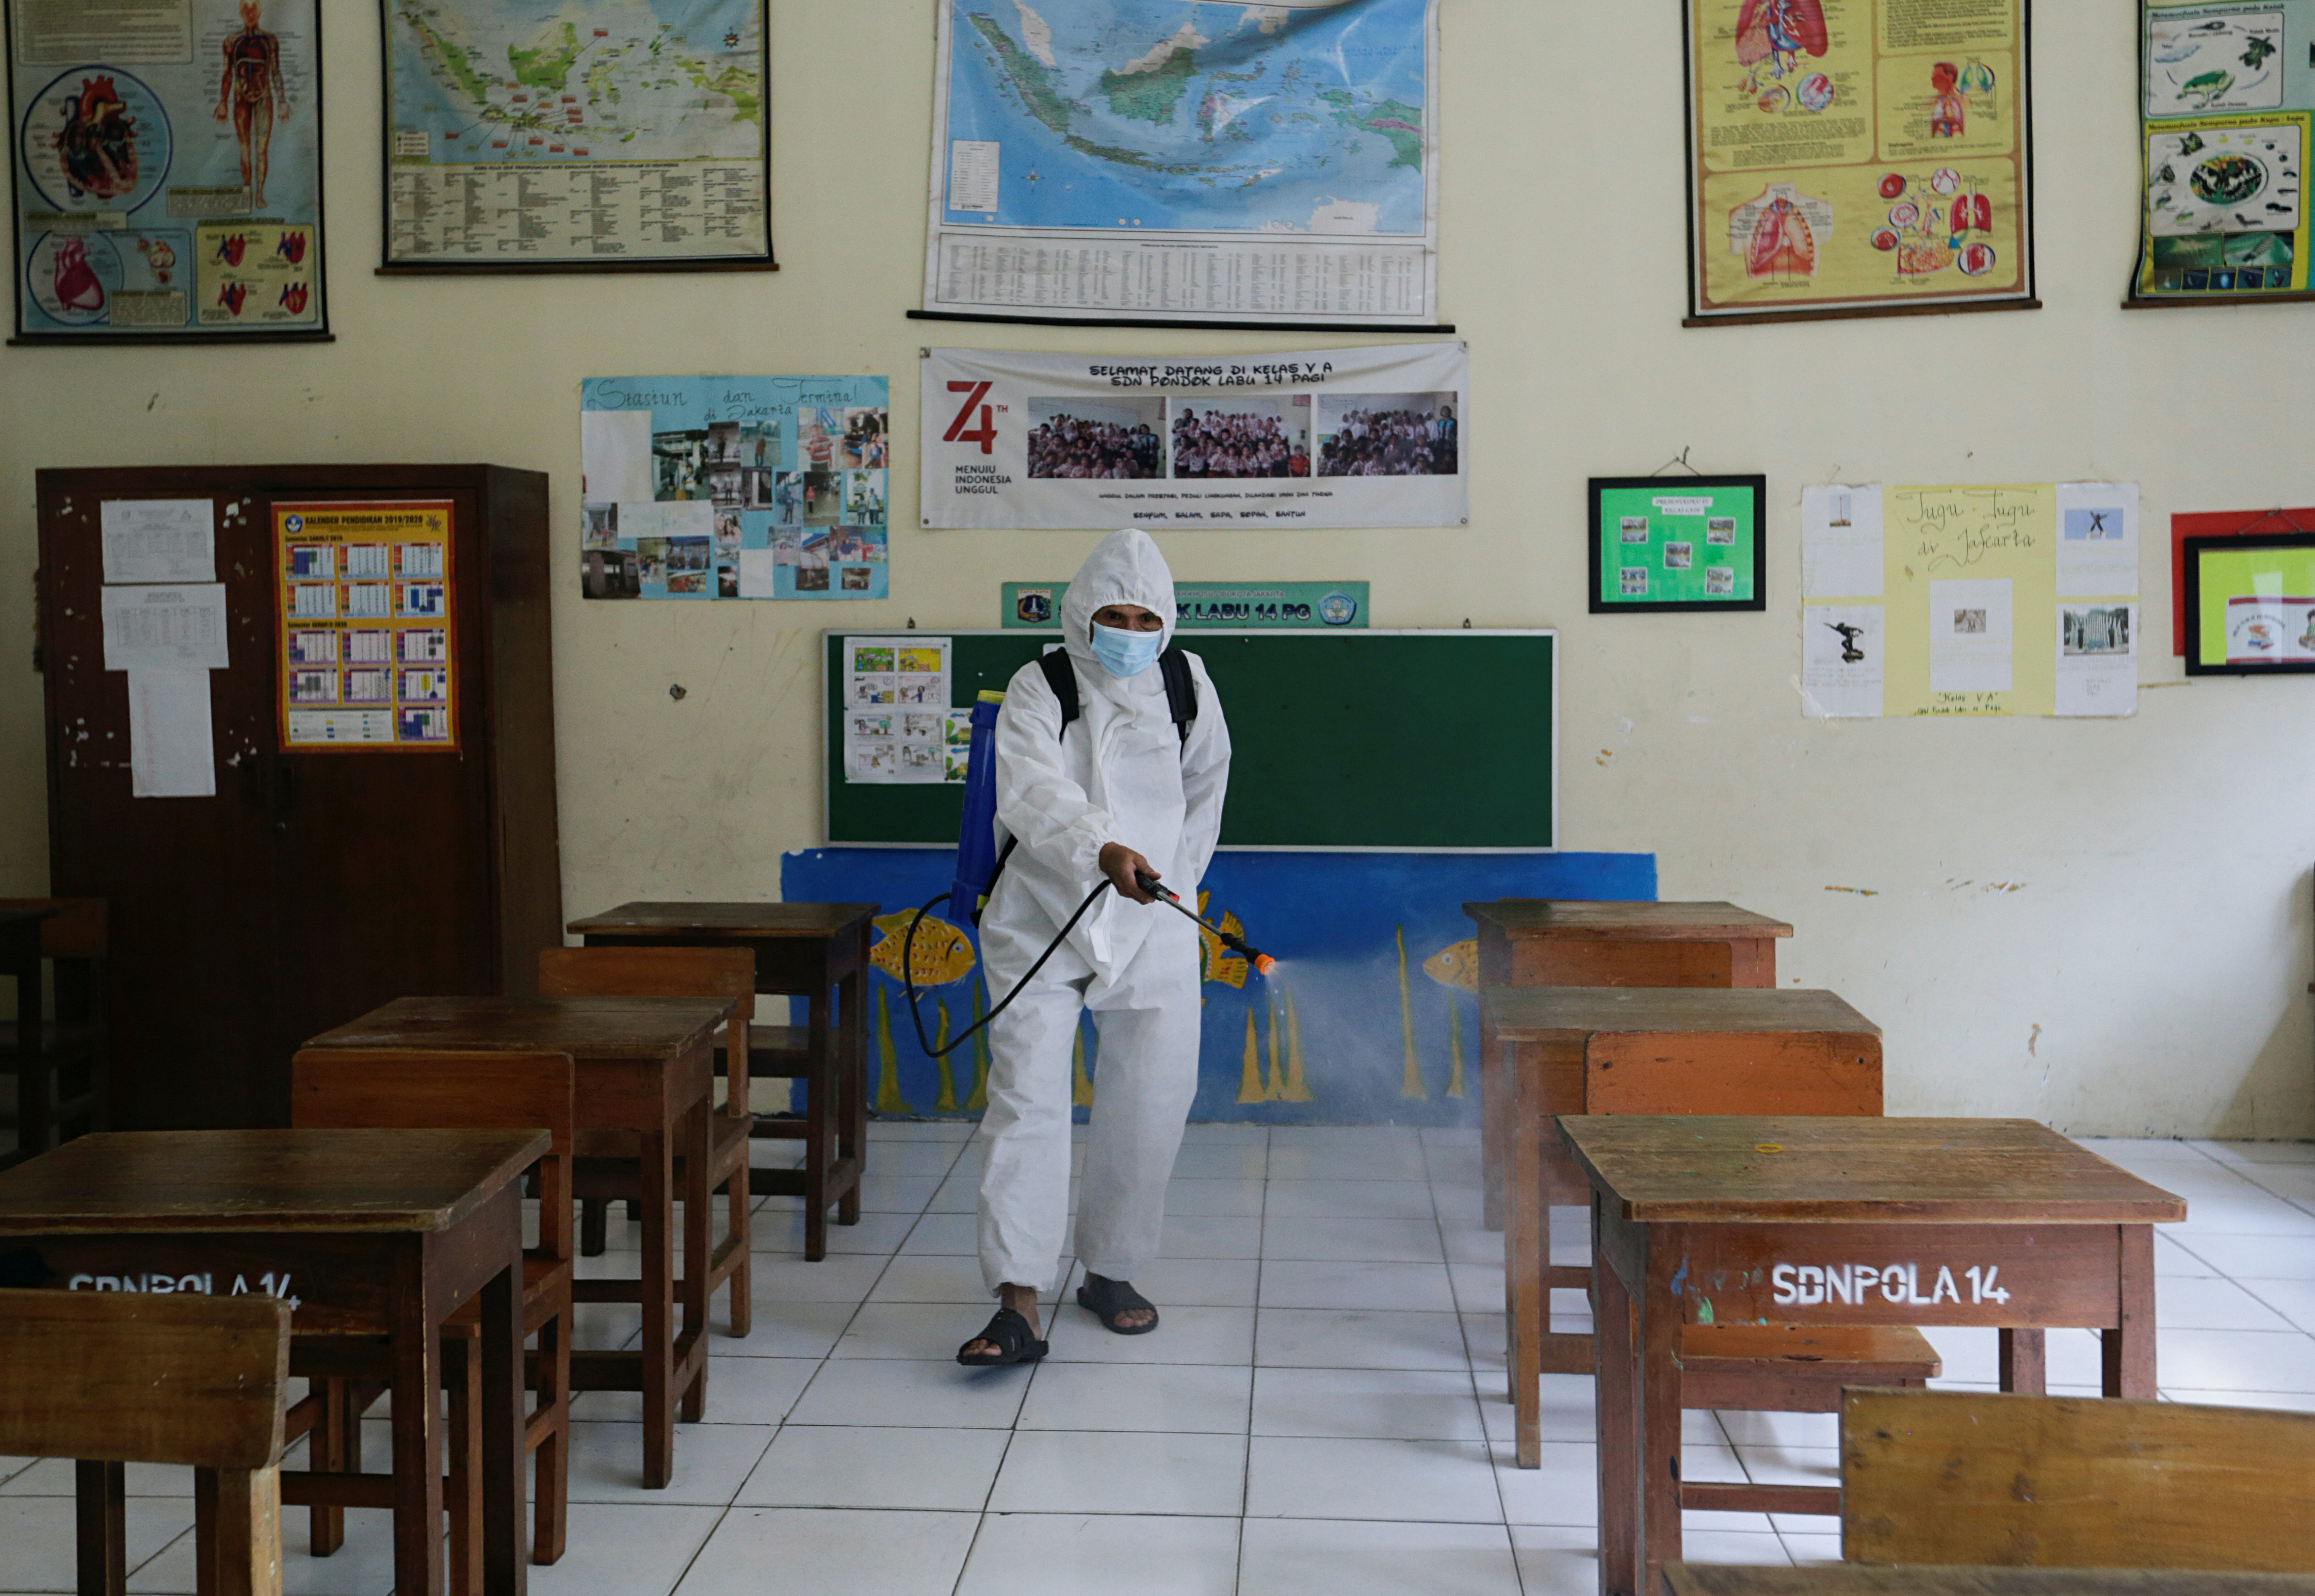 Indonesia schools start cautious reopening after devastating virus wave